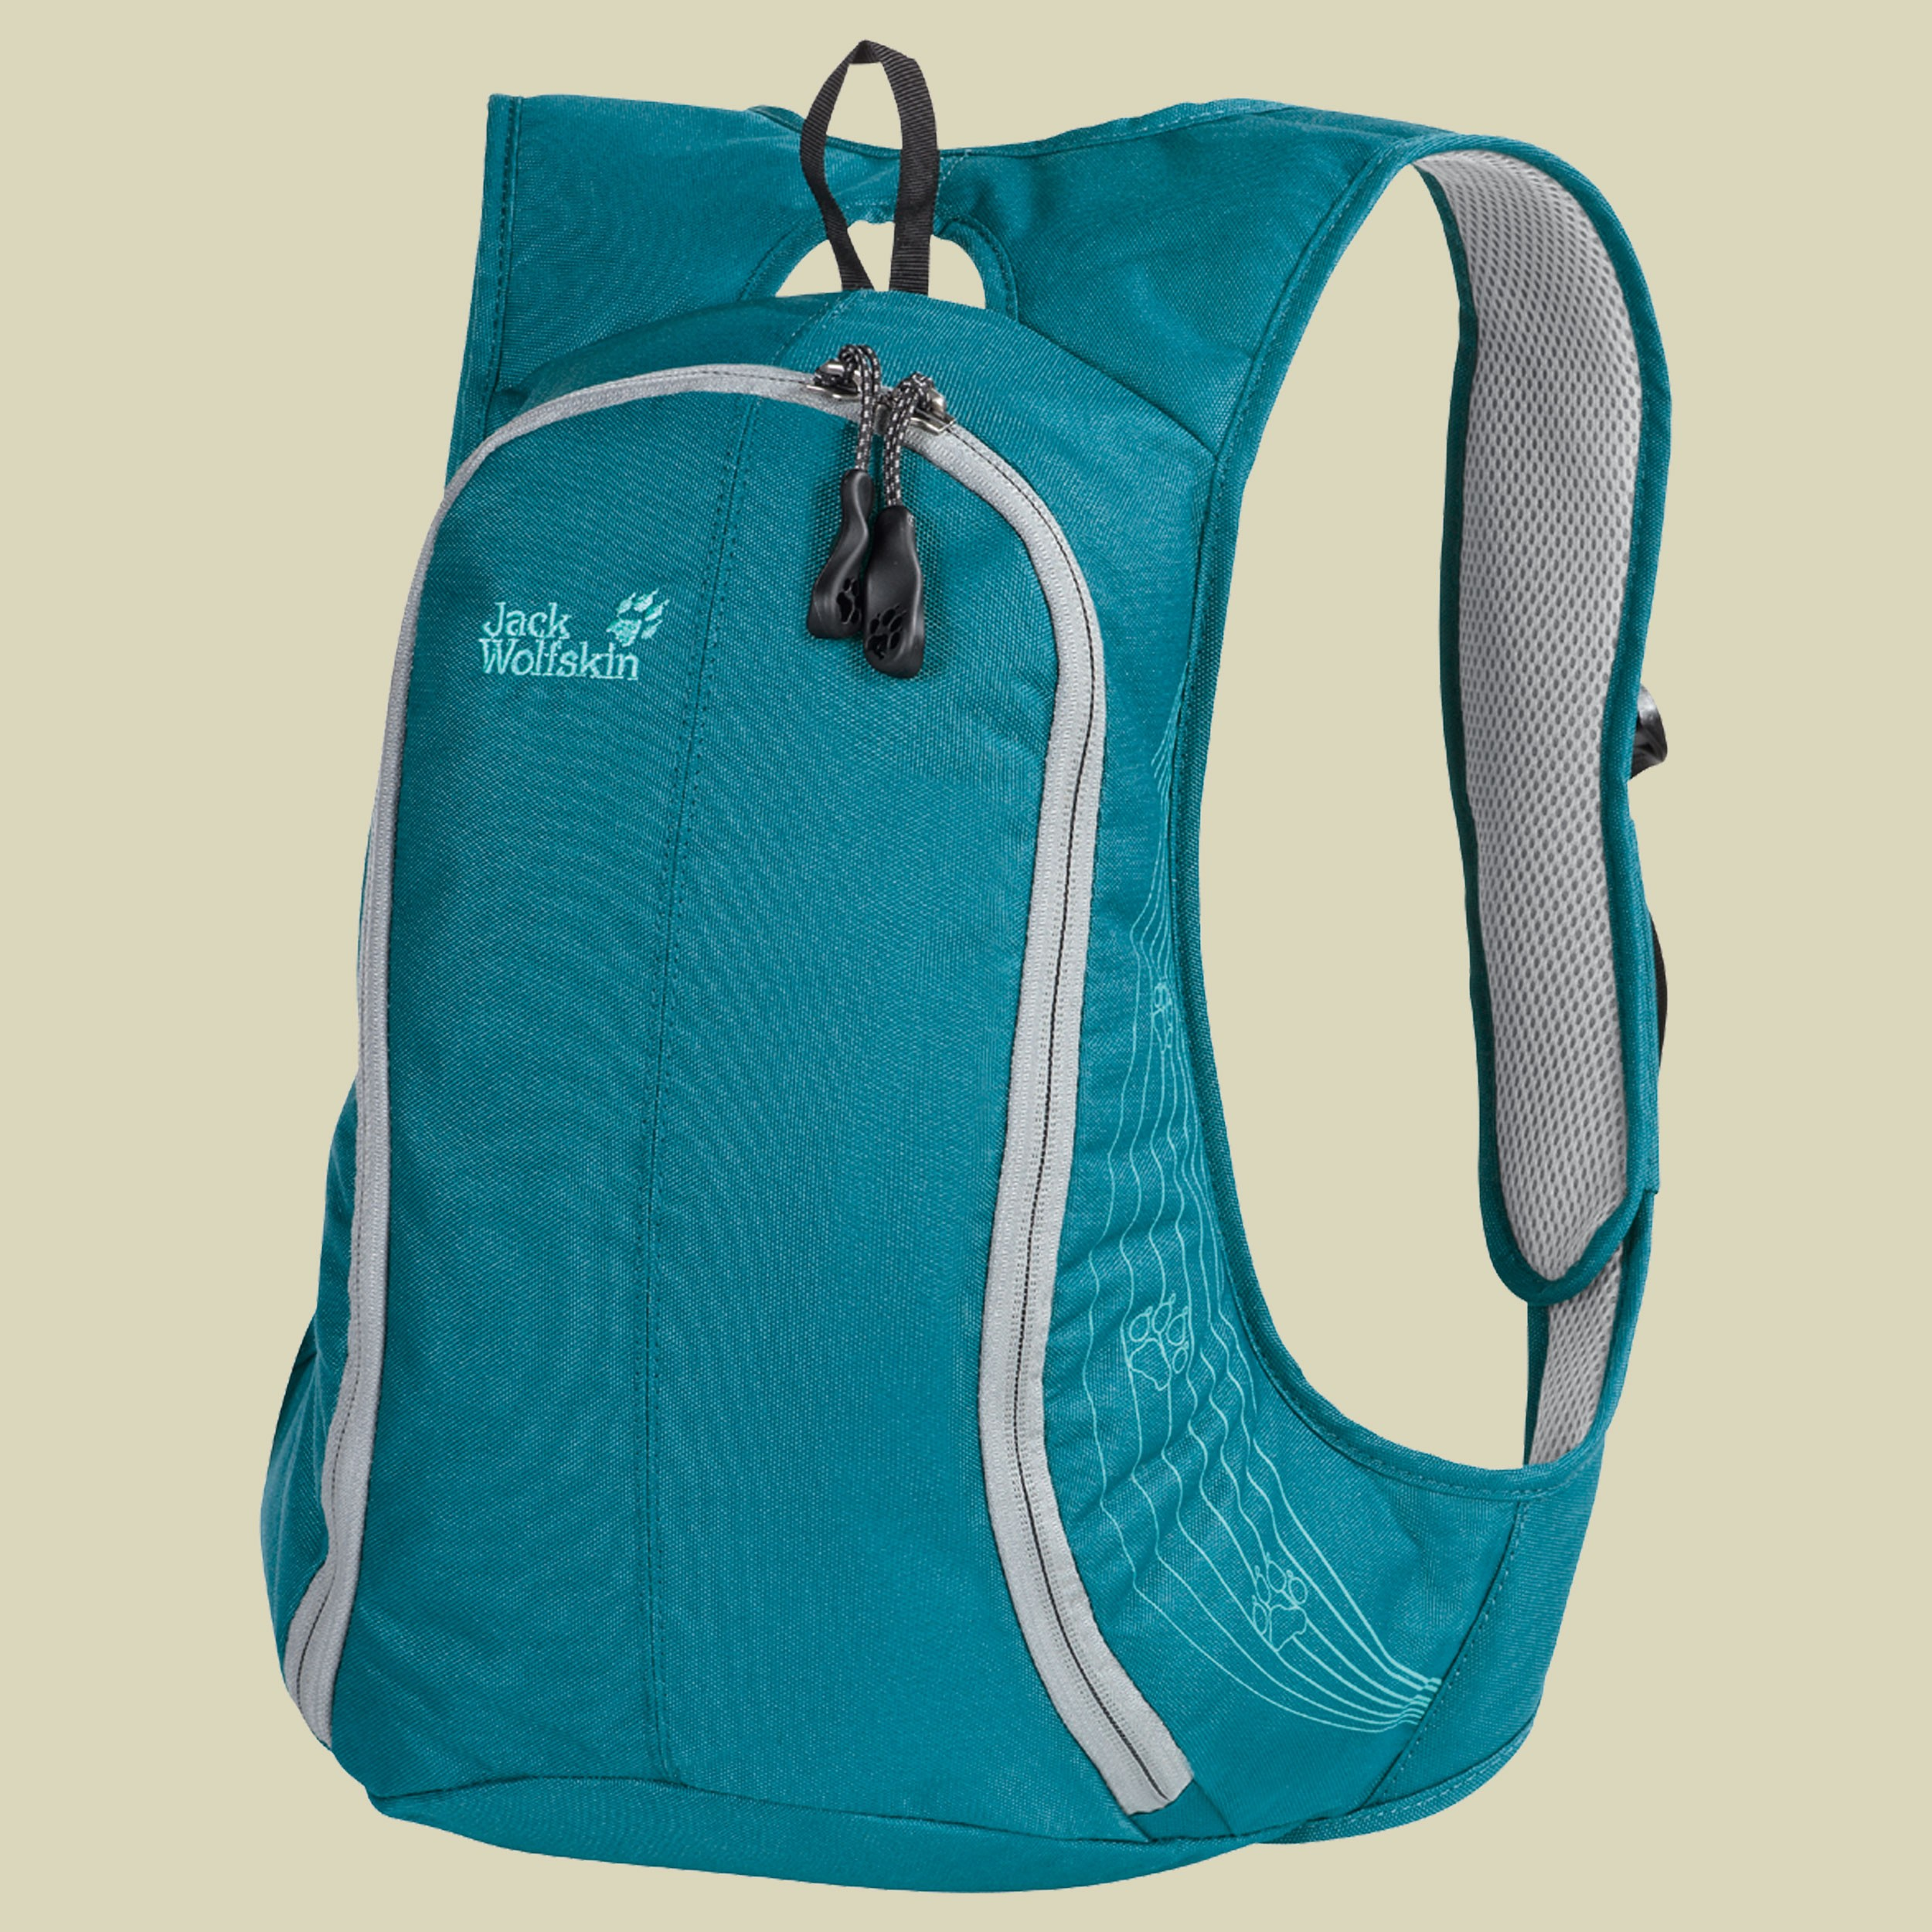 backpack jack wolfskin damen türkis